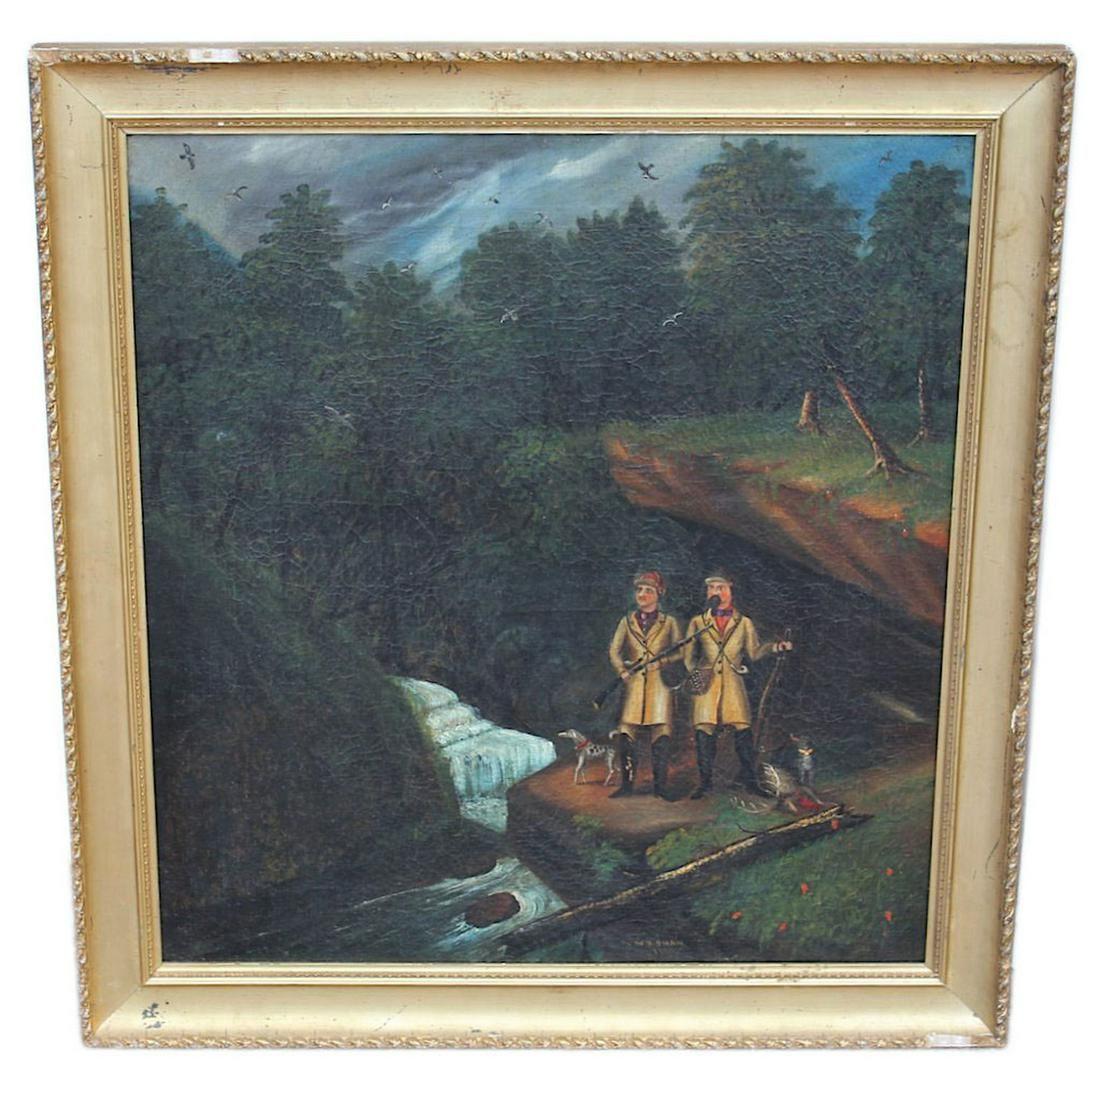 Folk Art Painting of Hunters - 1864